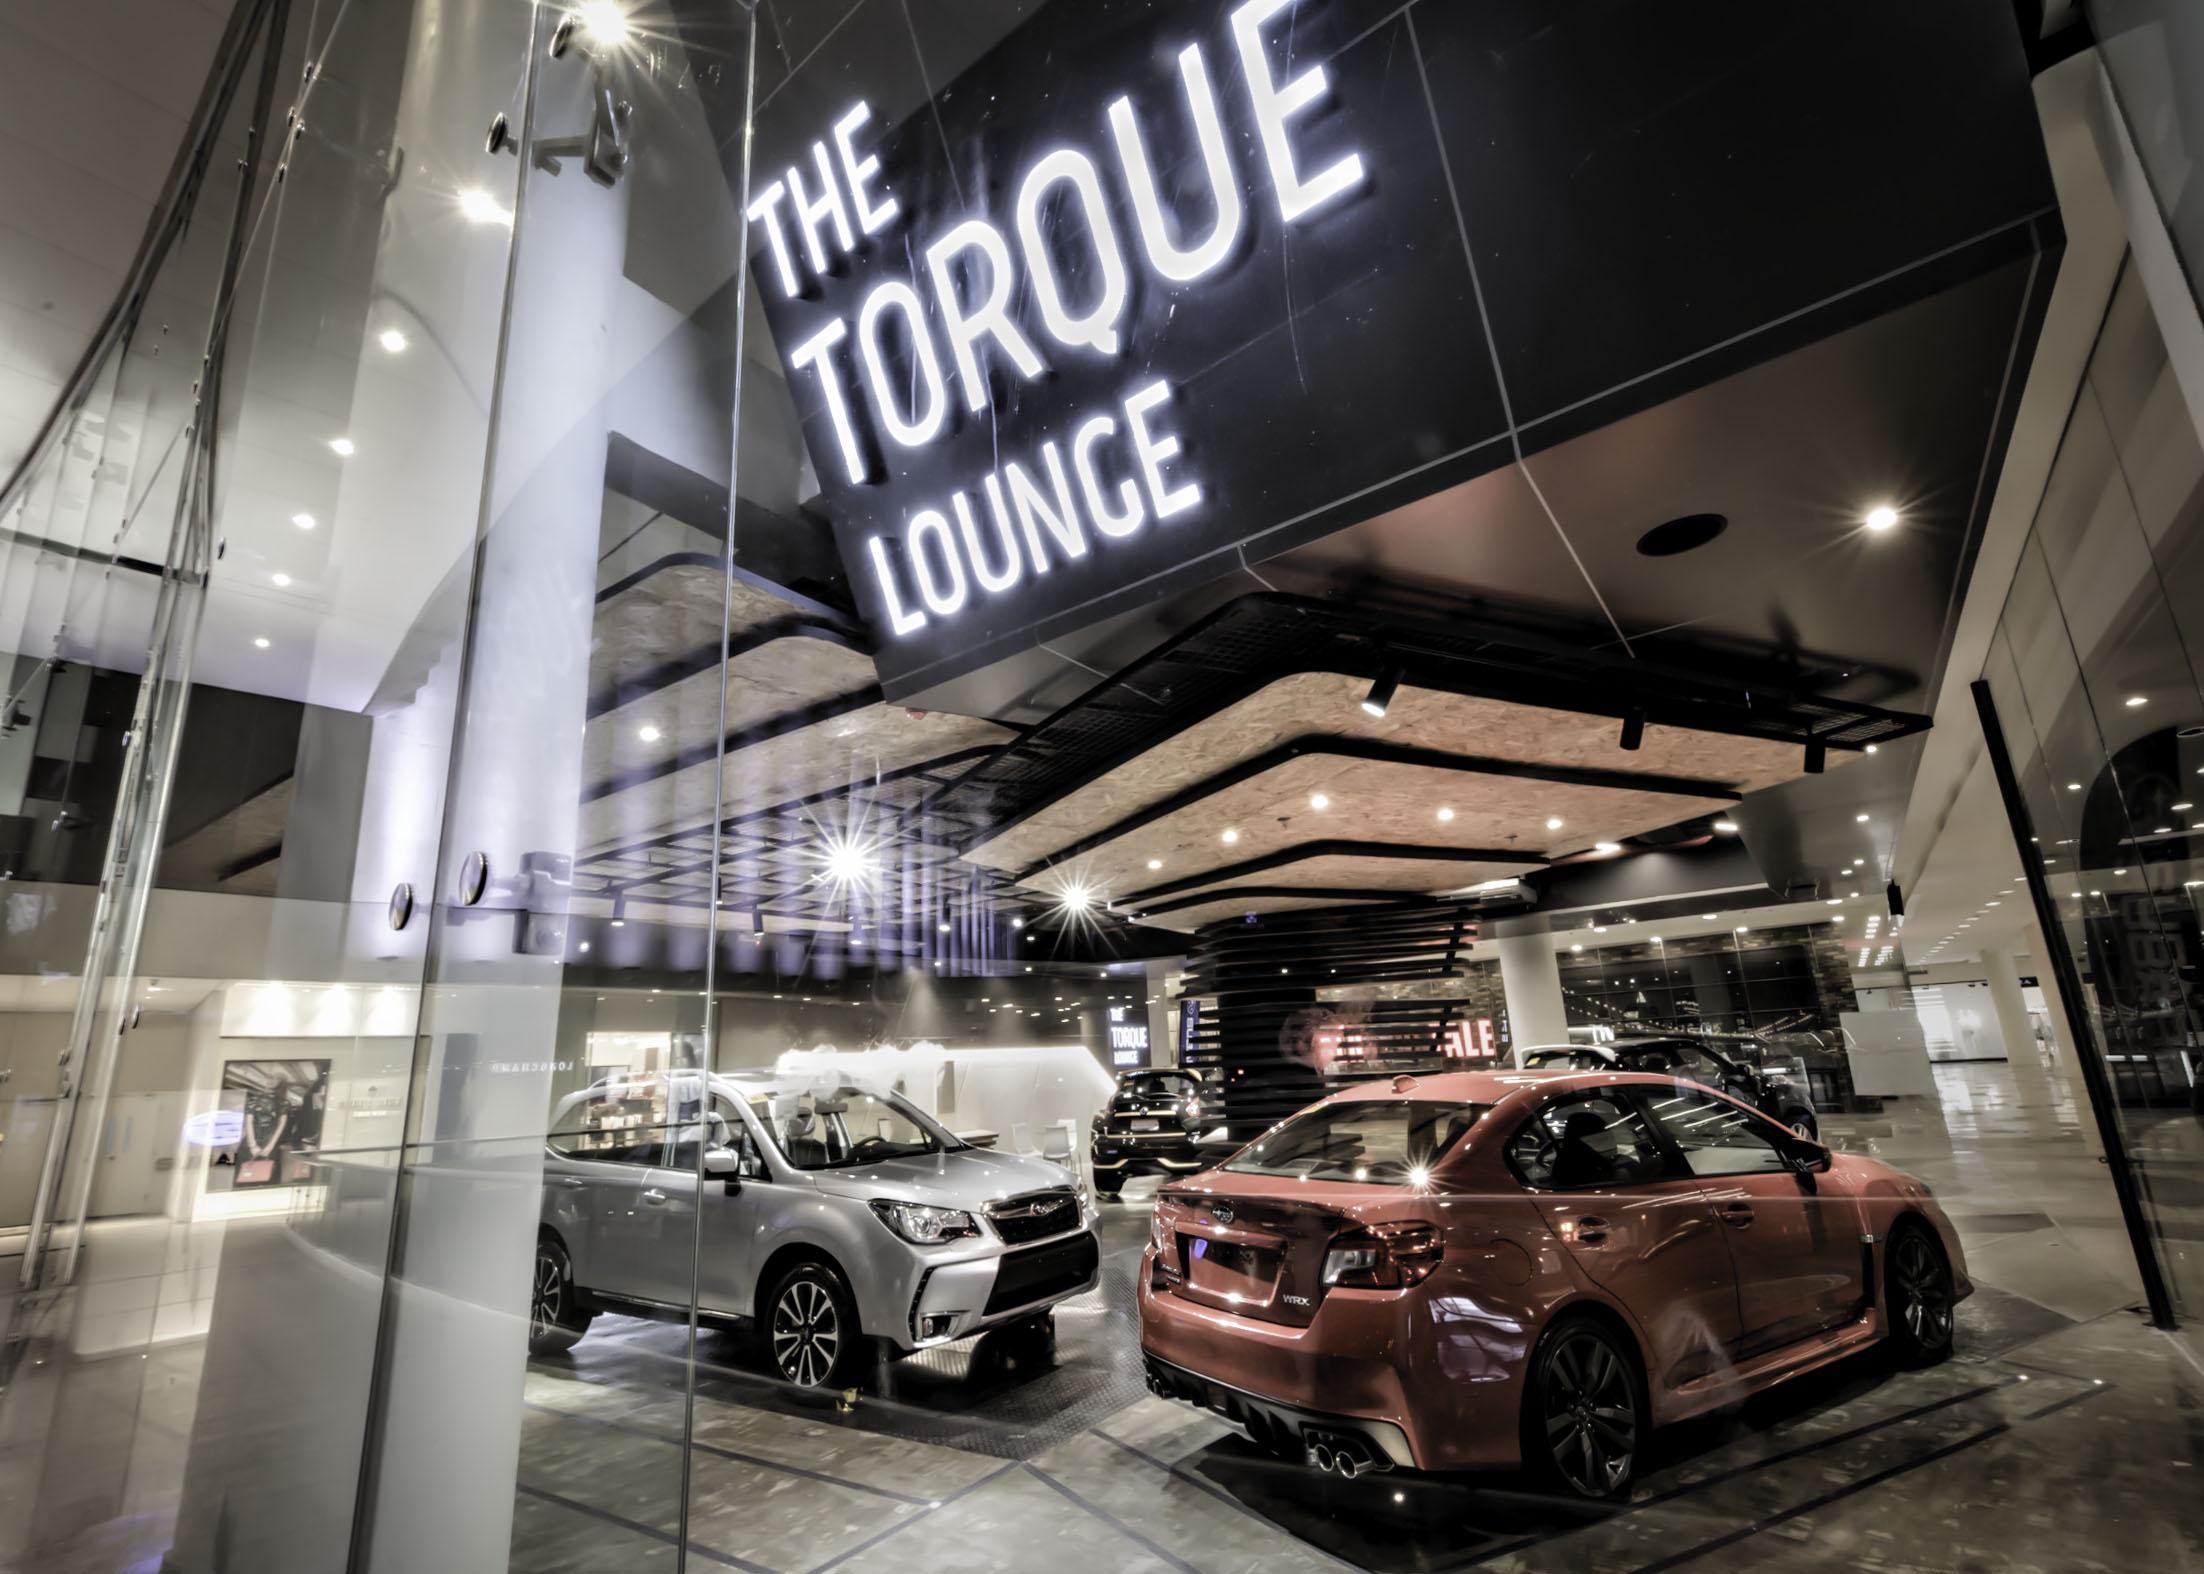 Torque Lounge